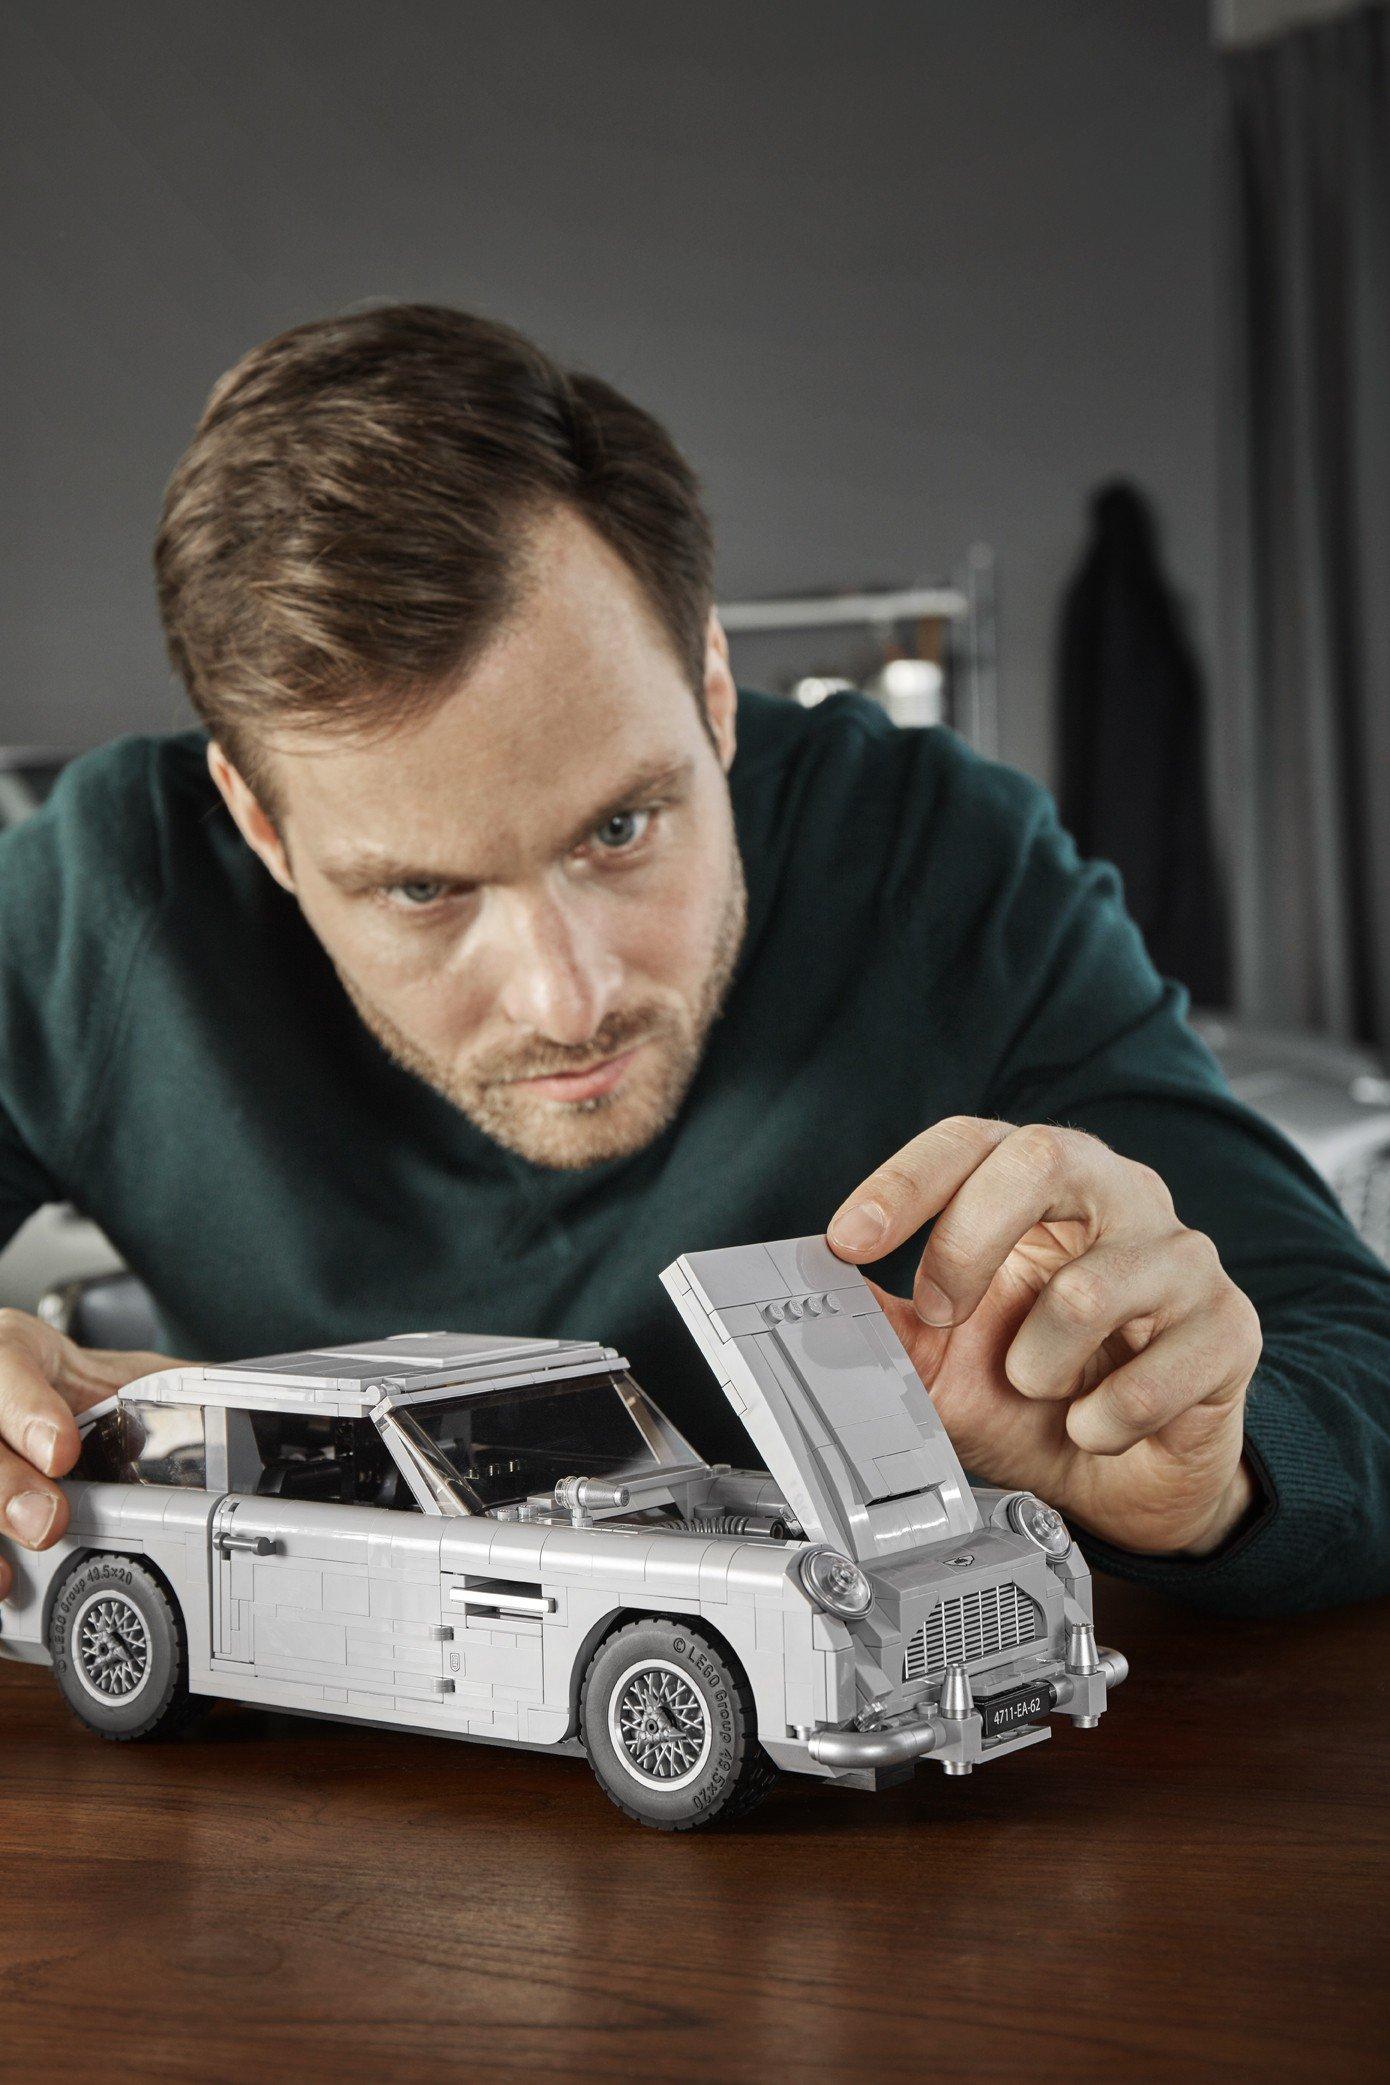 Lego Aston Martin DB5 (17)